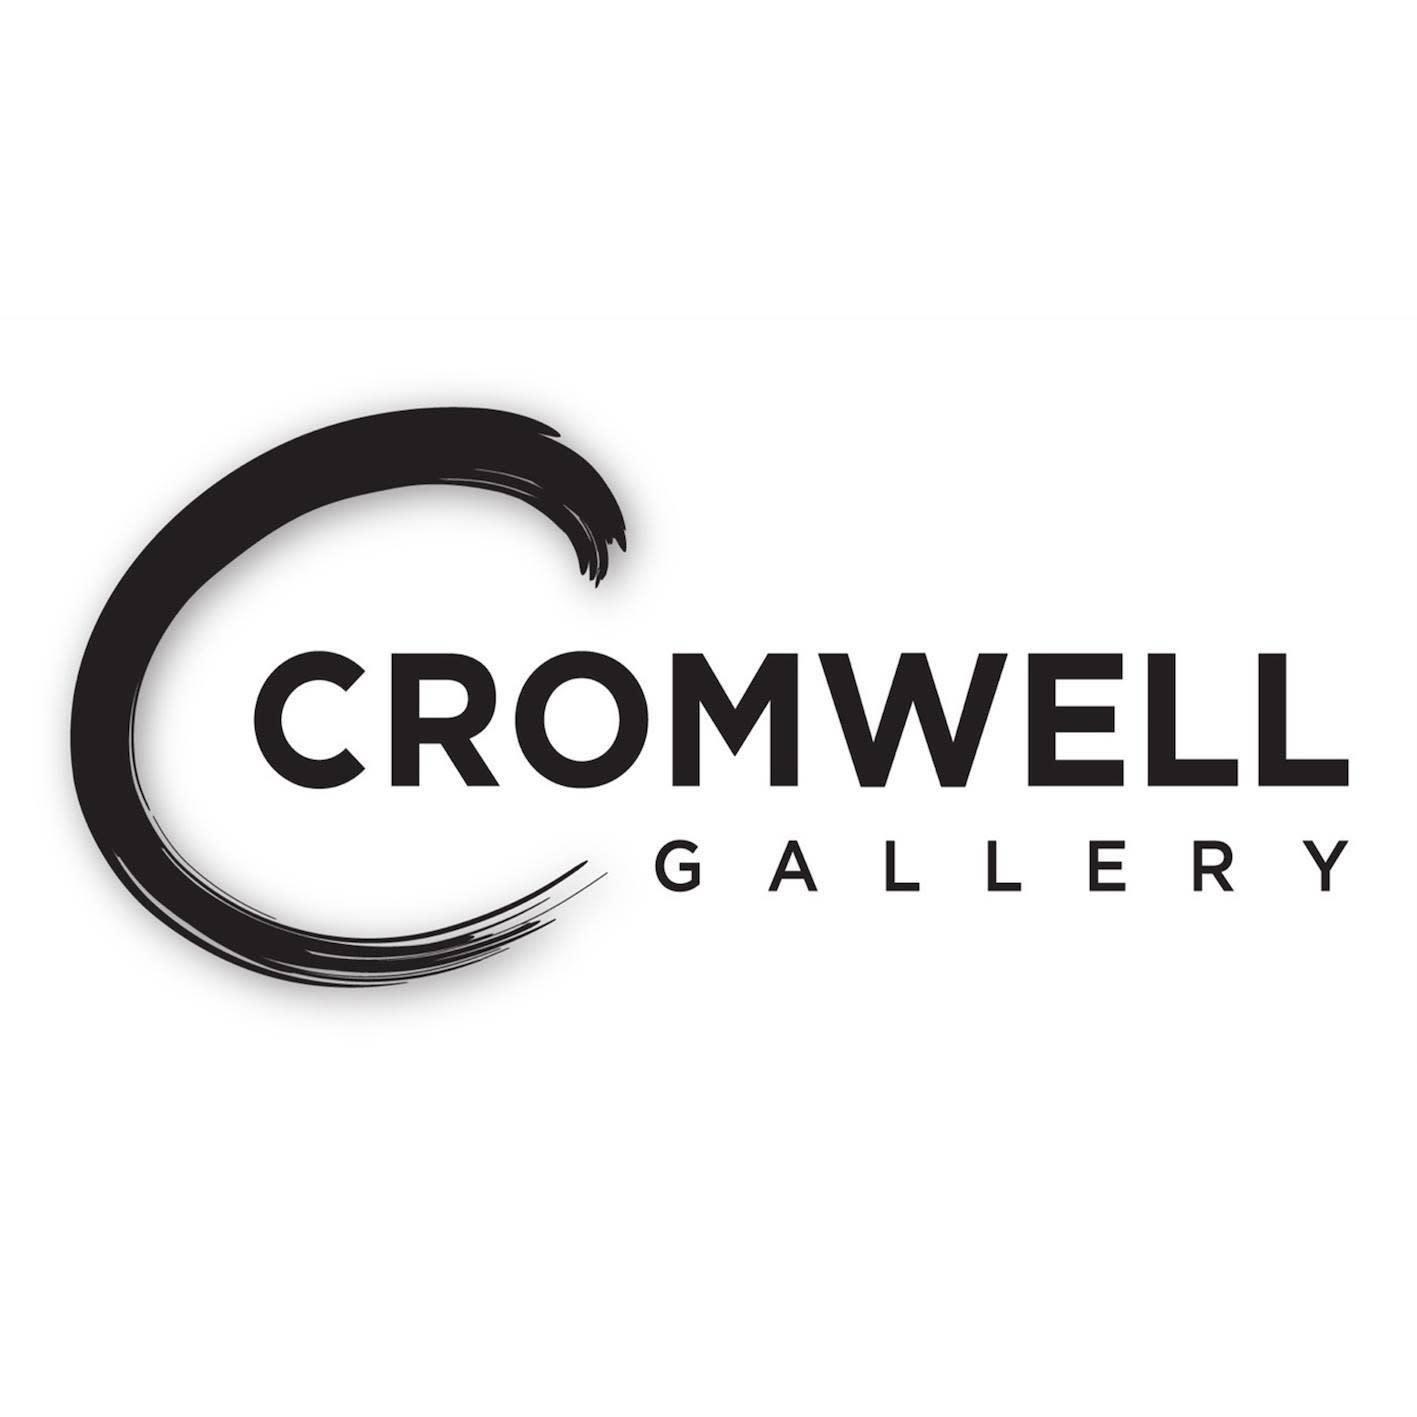 cromwellgallery